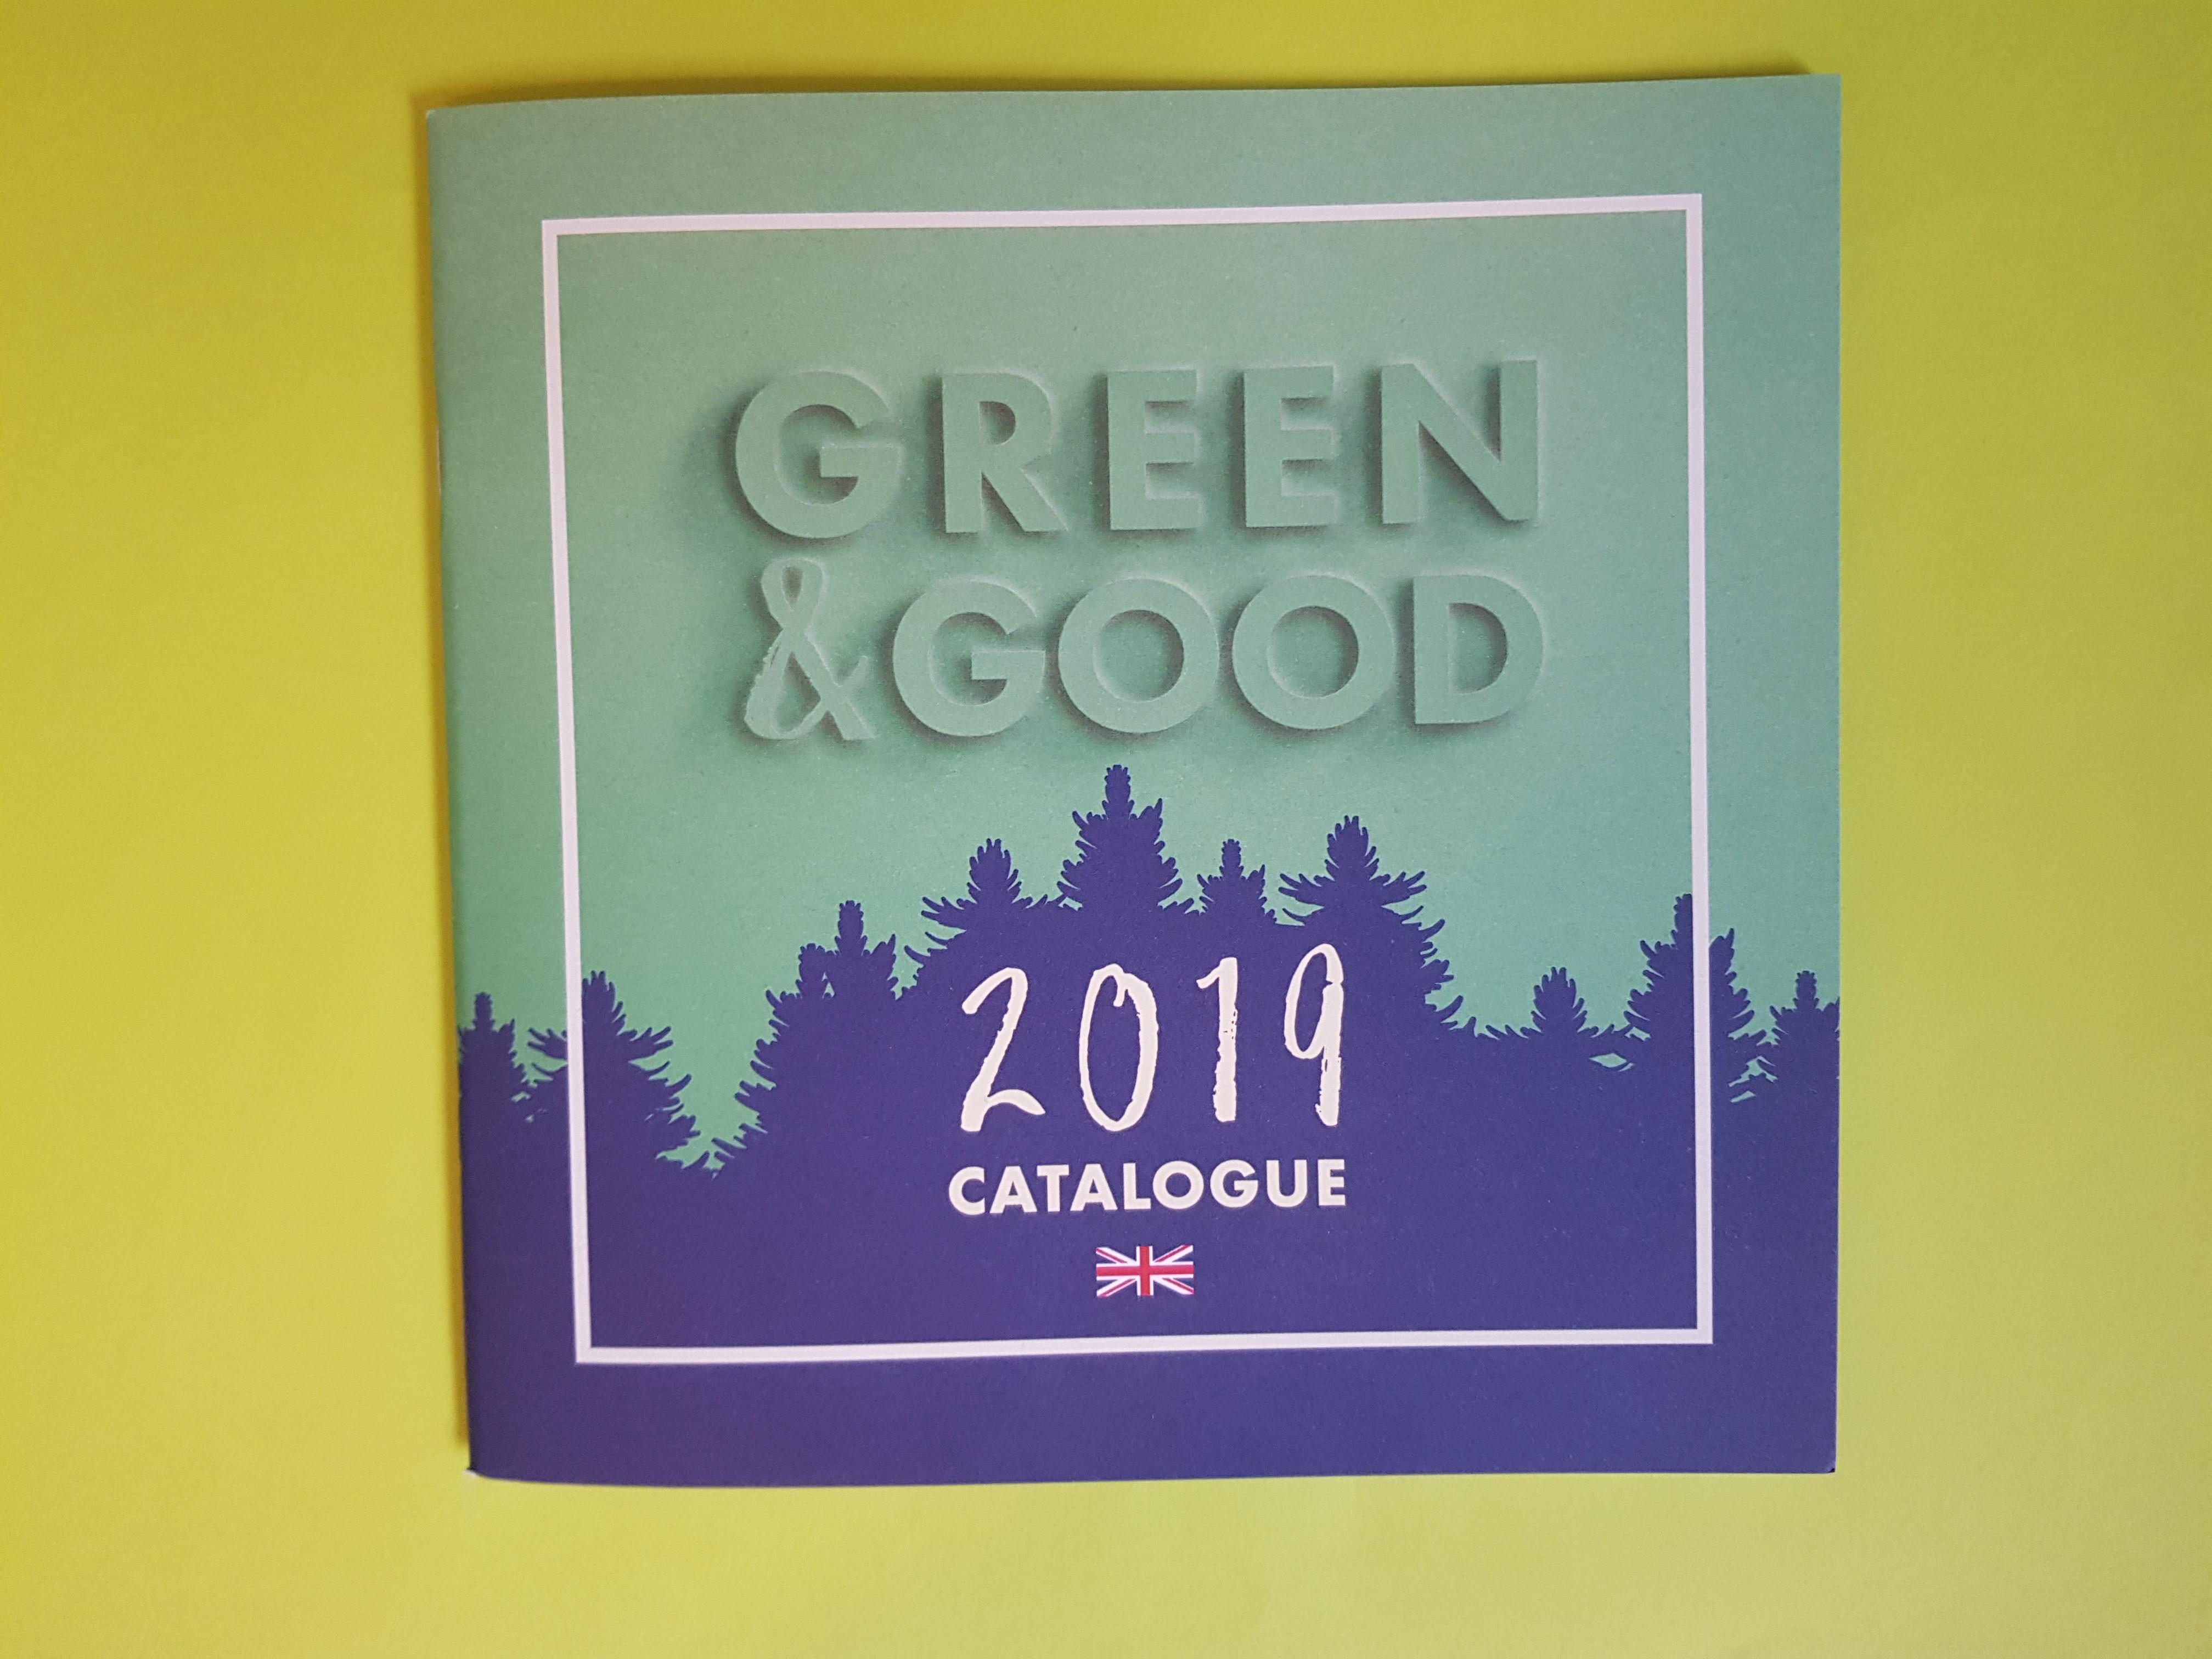 Green & Good